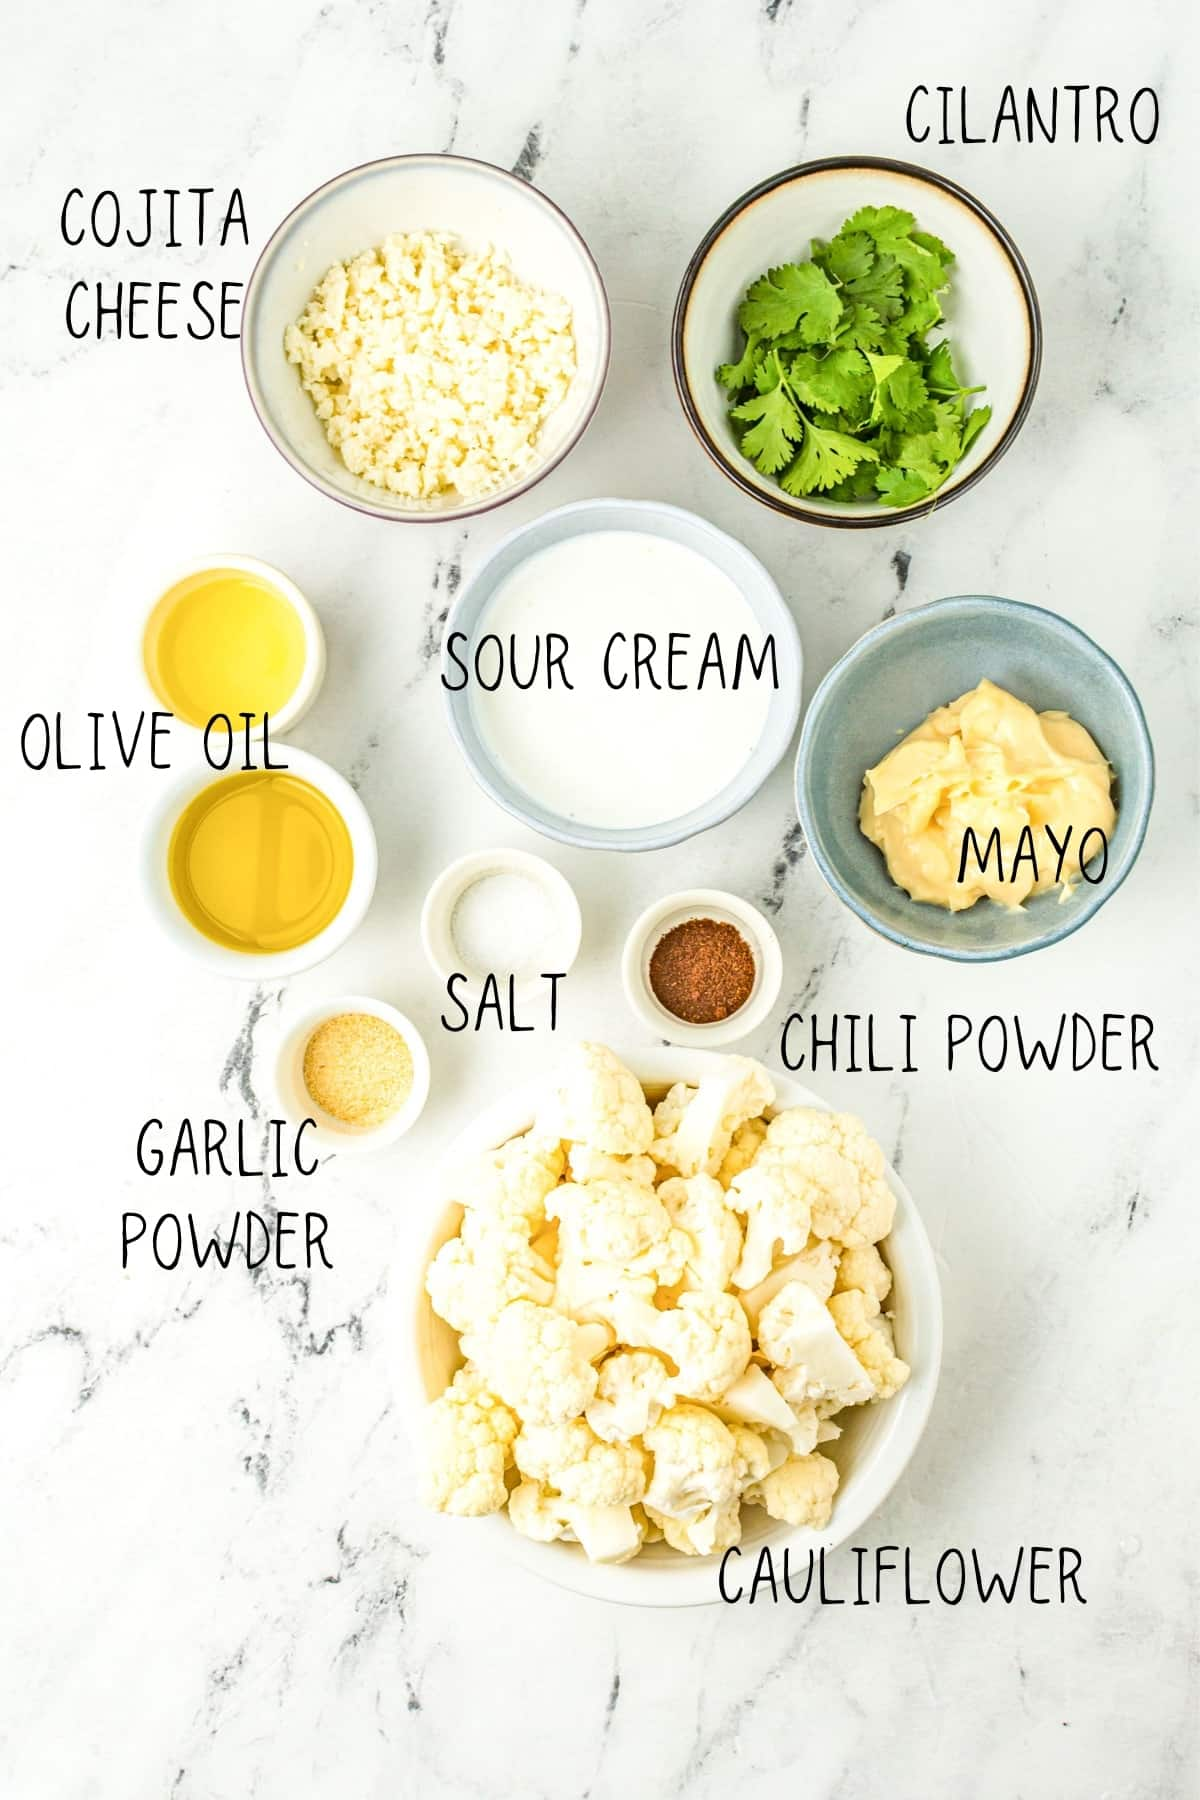 street cauliflower ingredients: olive oil, garlic powder, chili powder, mayo, sour cream, salt, cilantro